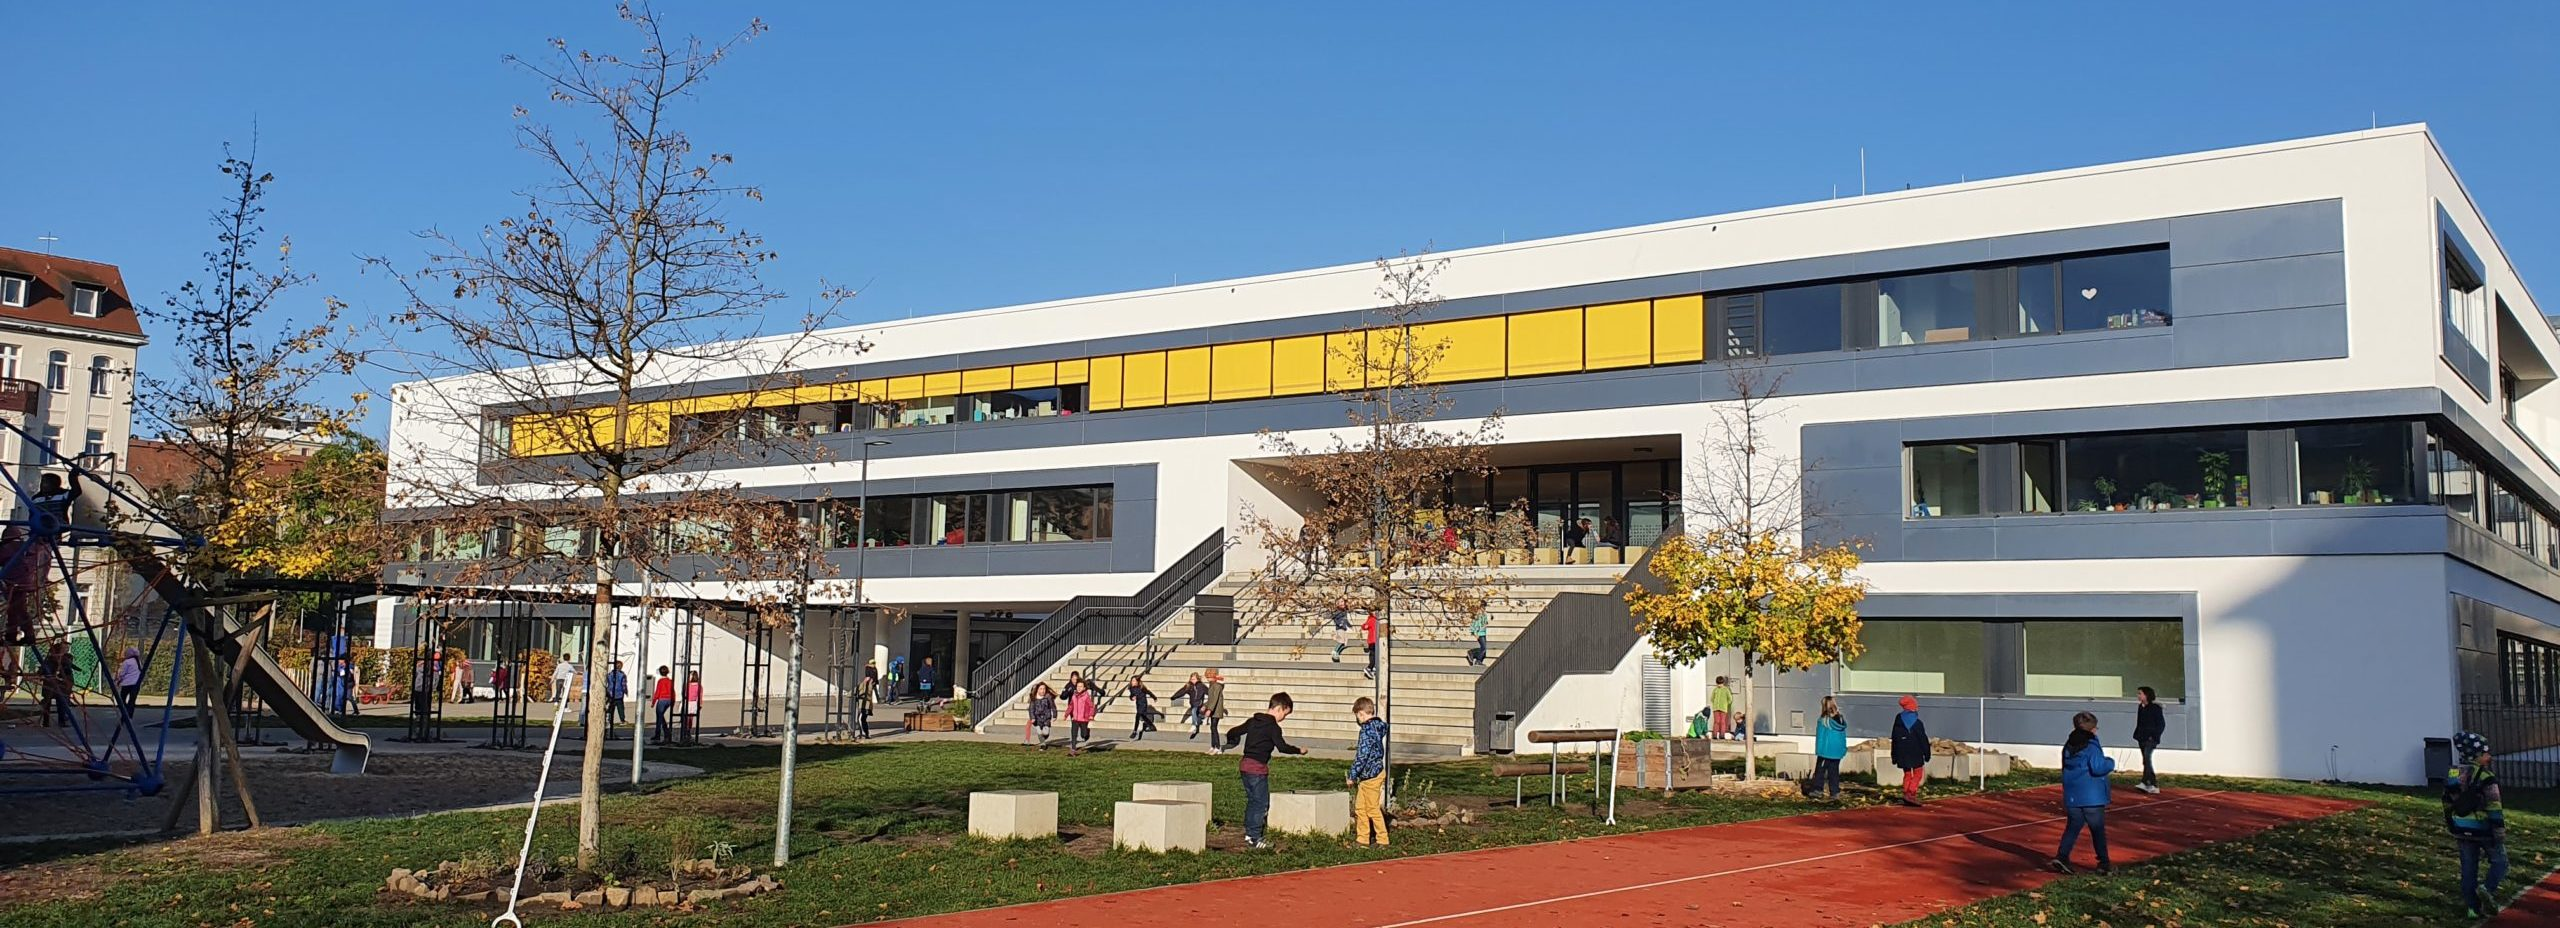 Kurt-Masur-Schule